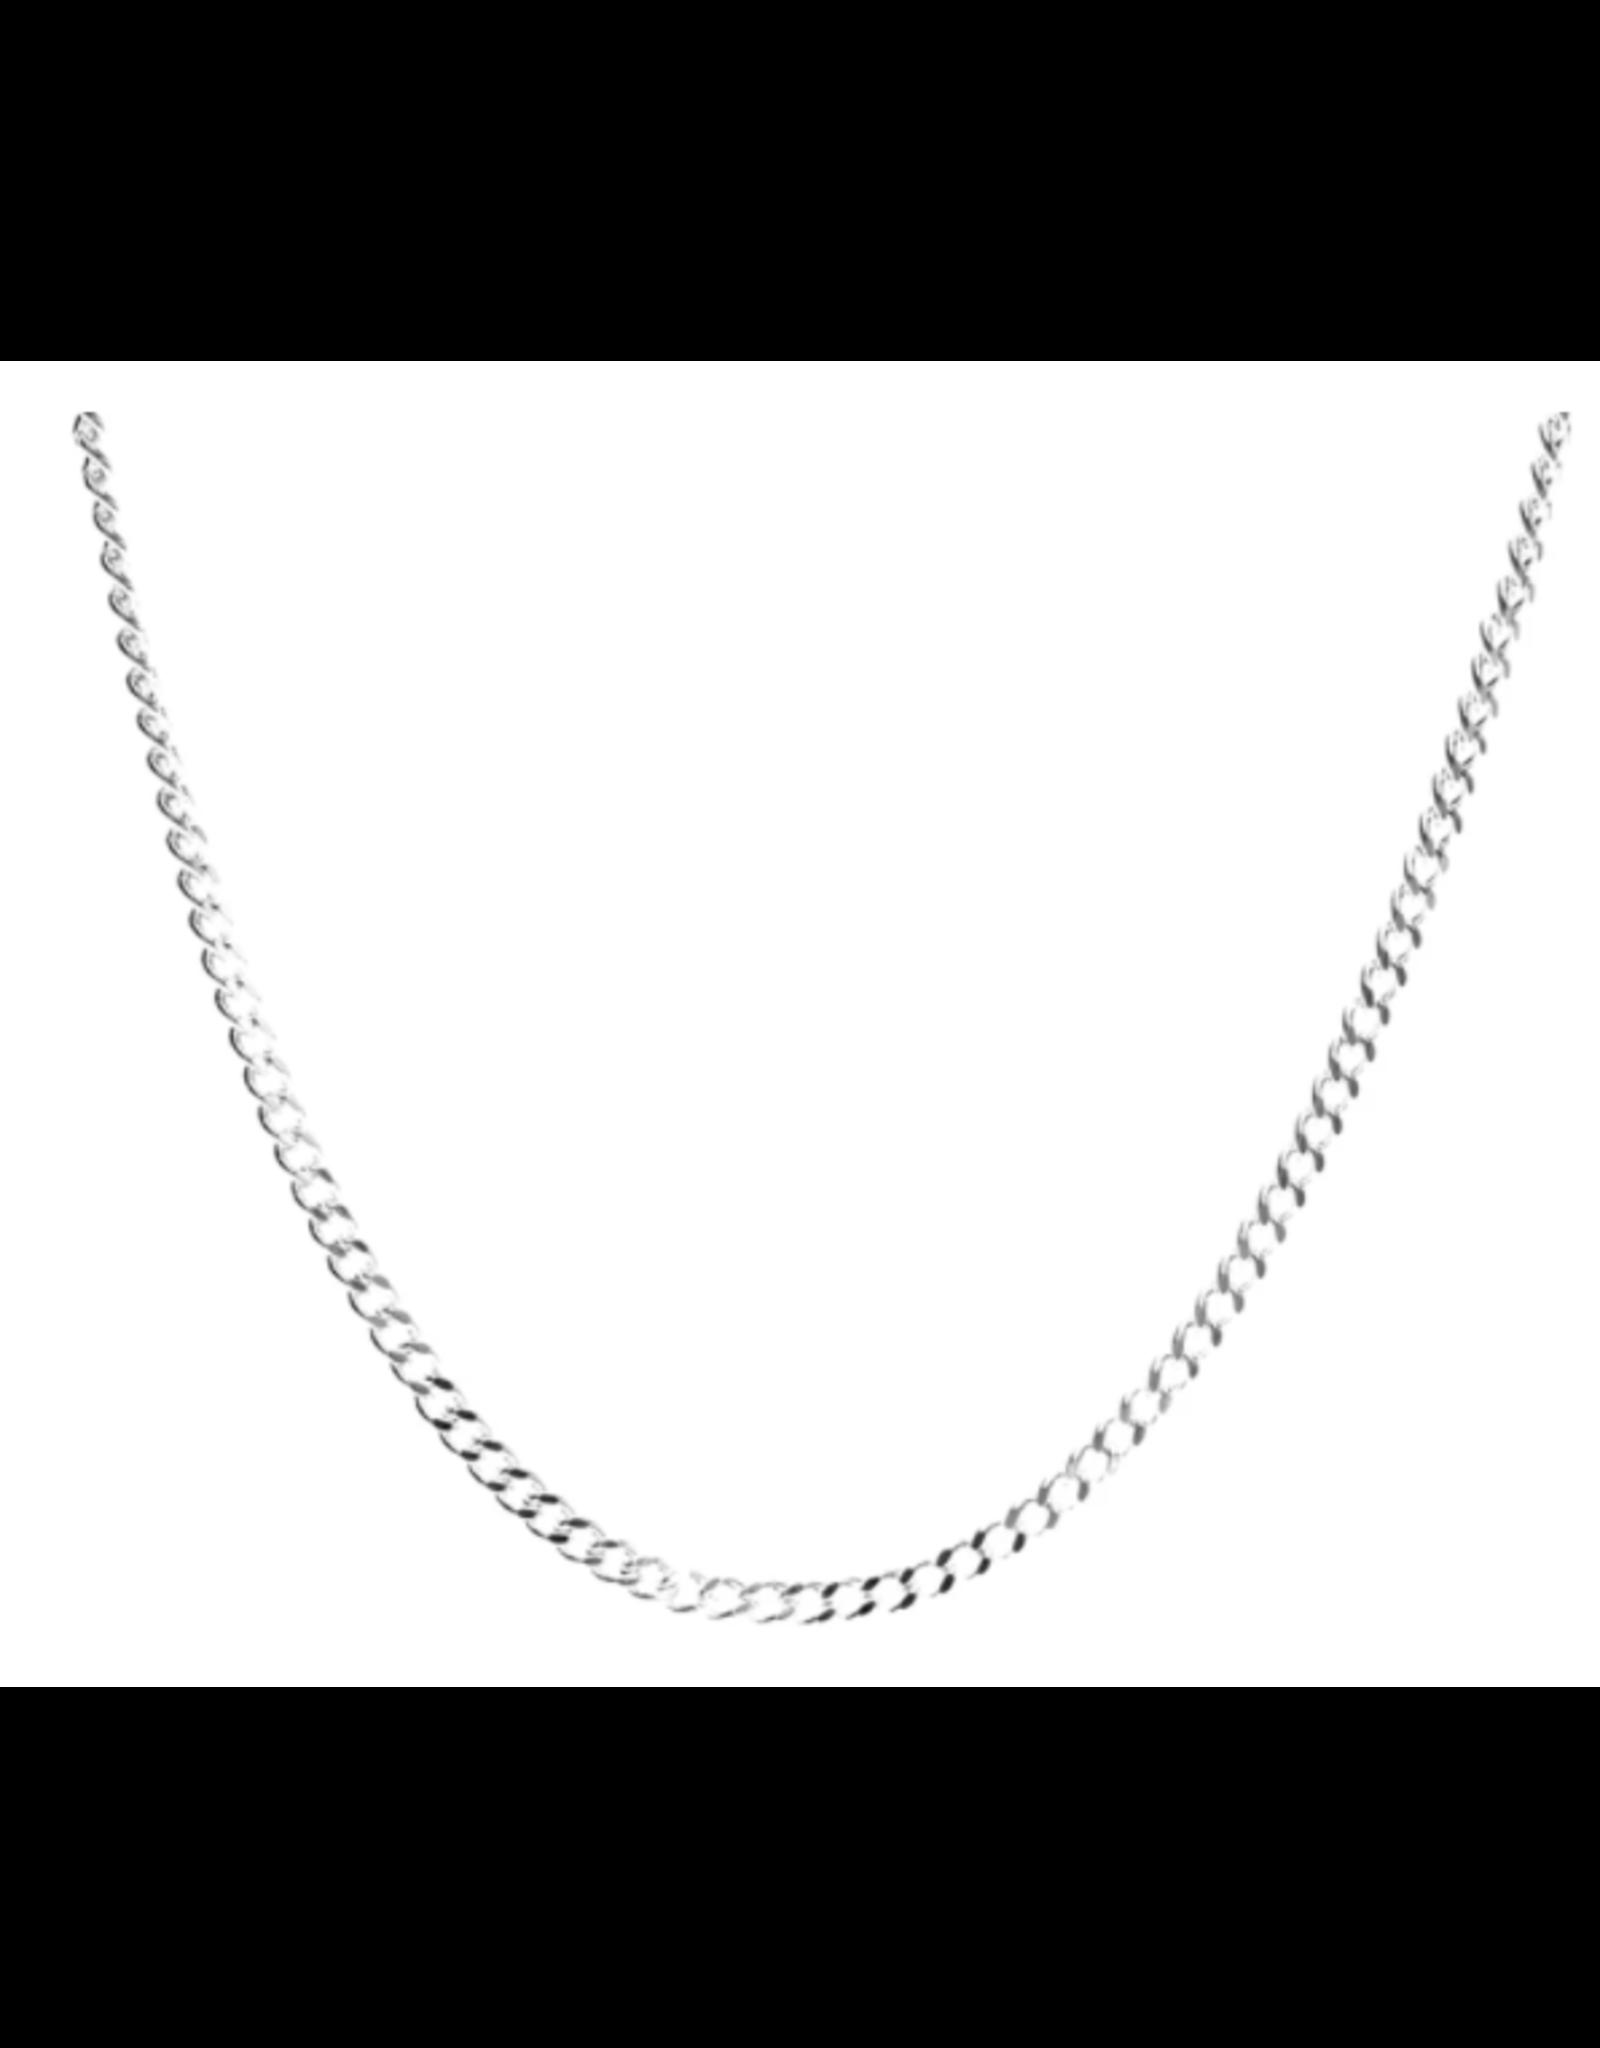 eLiasz and eLLa Sunnies & Mask Chain - Silver Jersey Chain